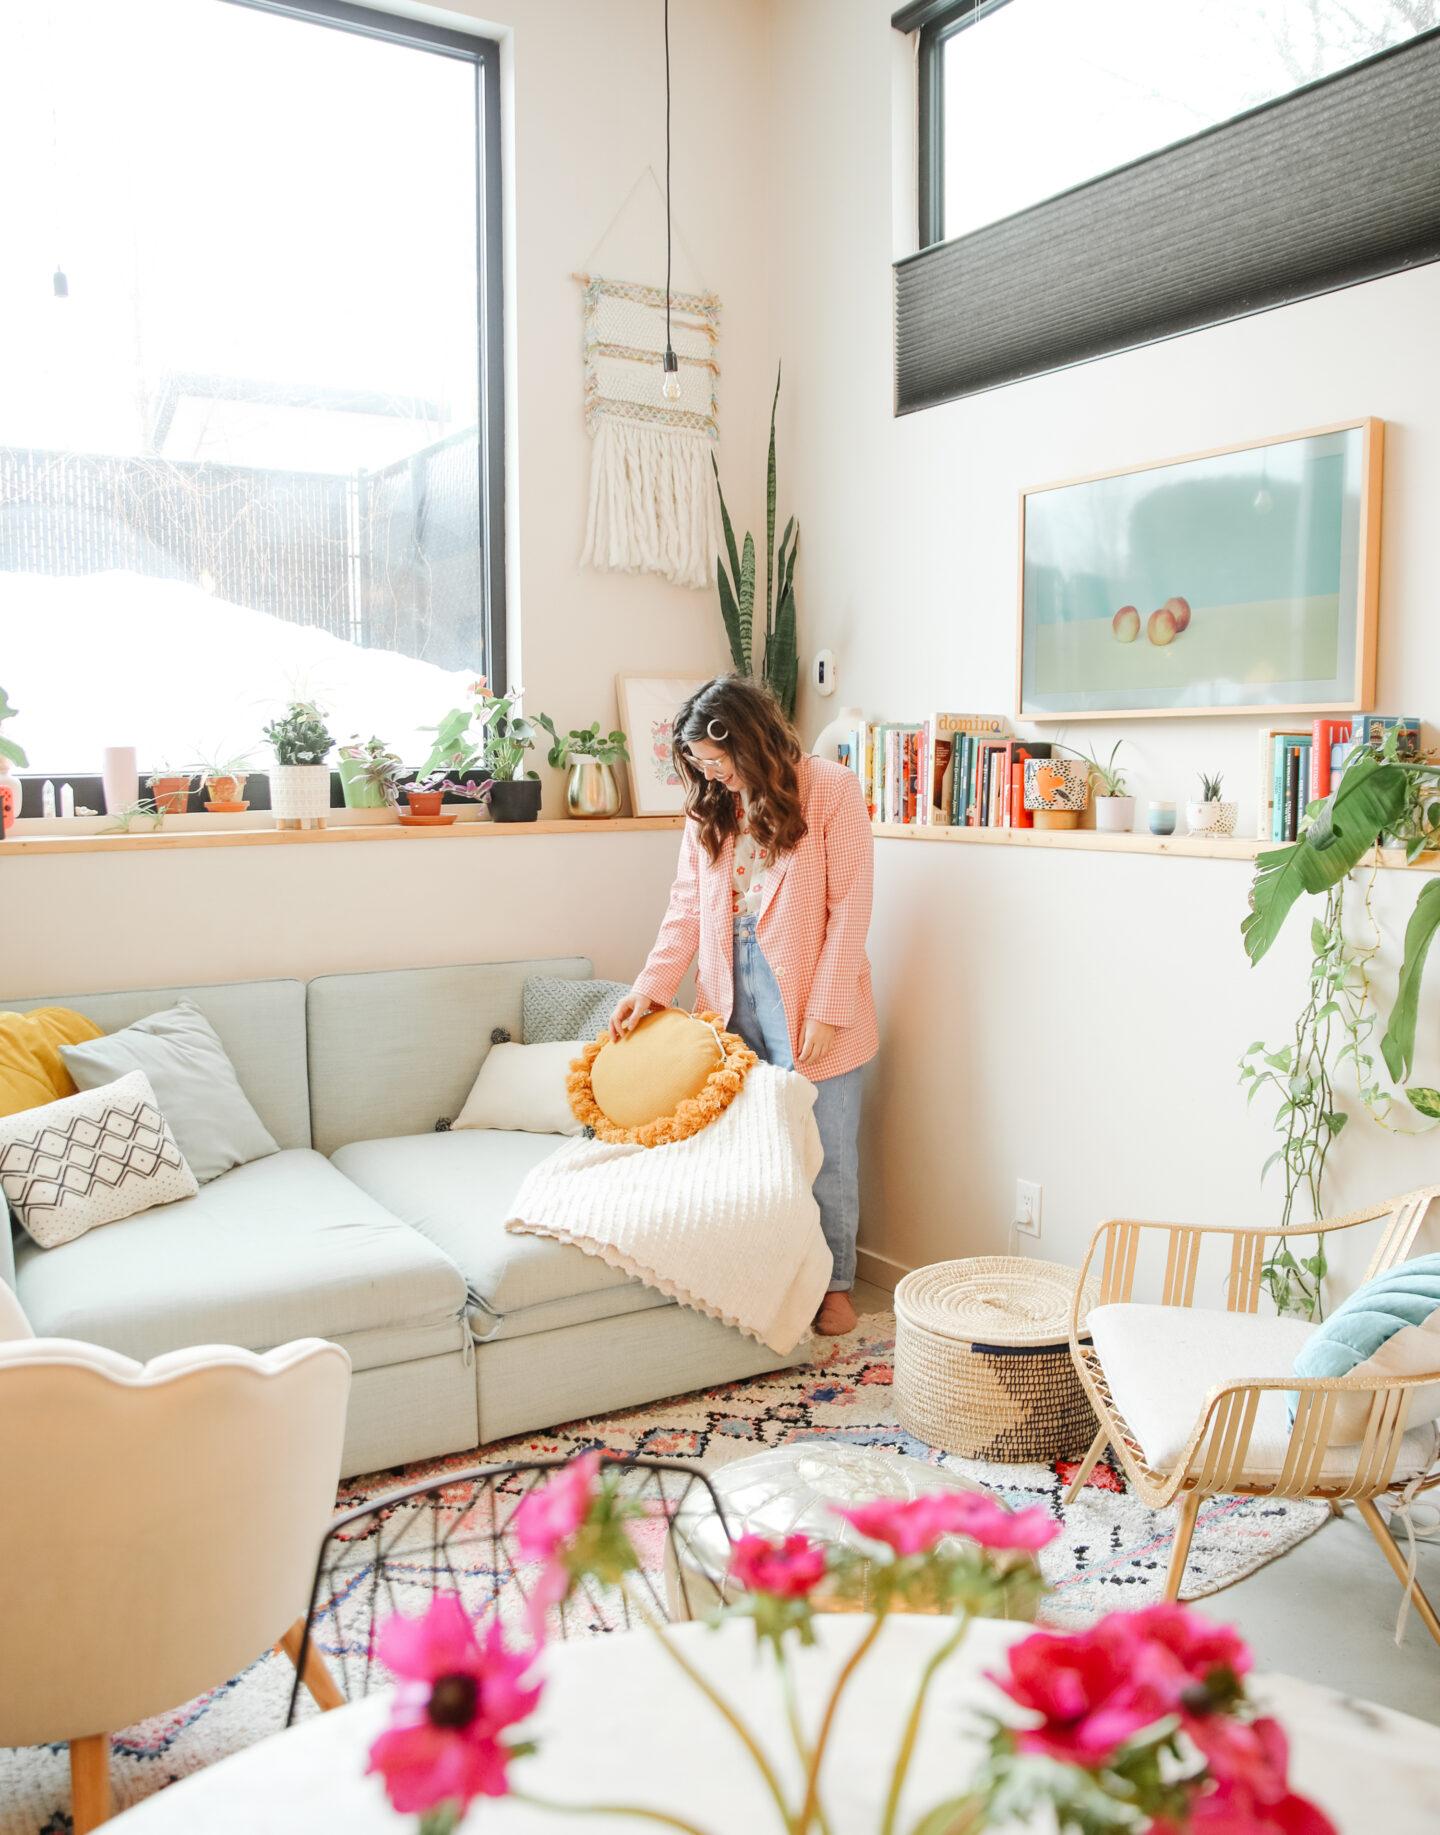 5 Fun Pillows you Need in your home decor!